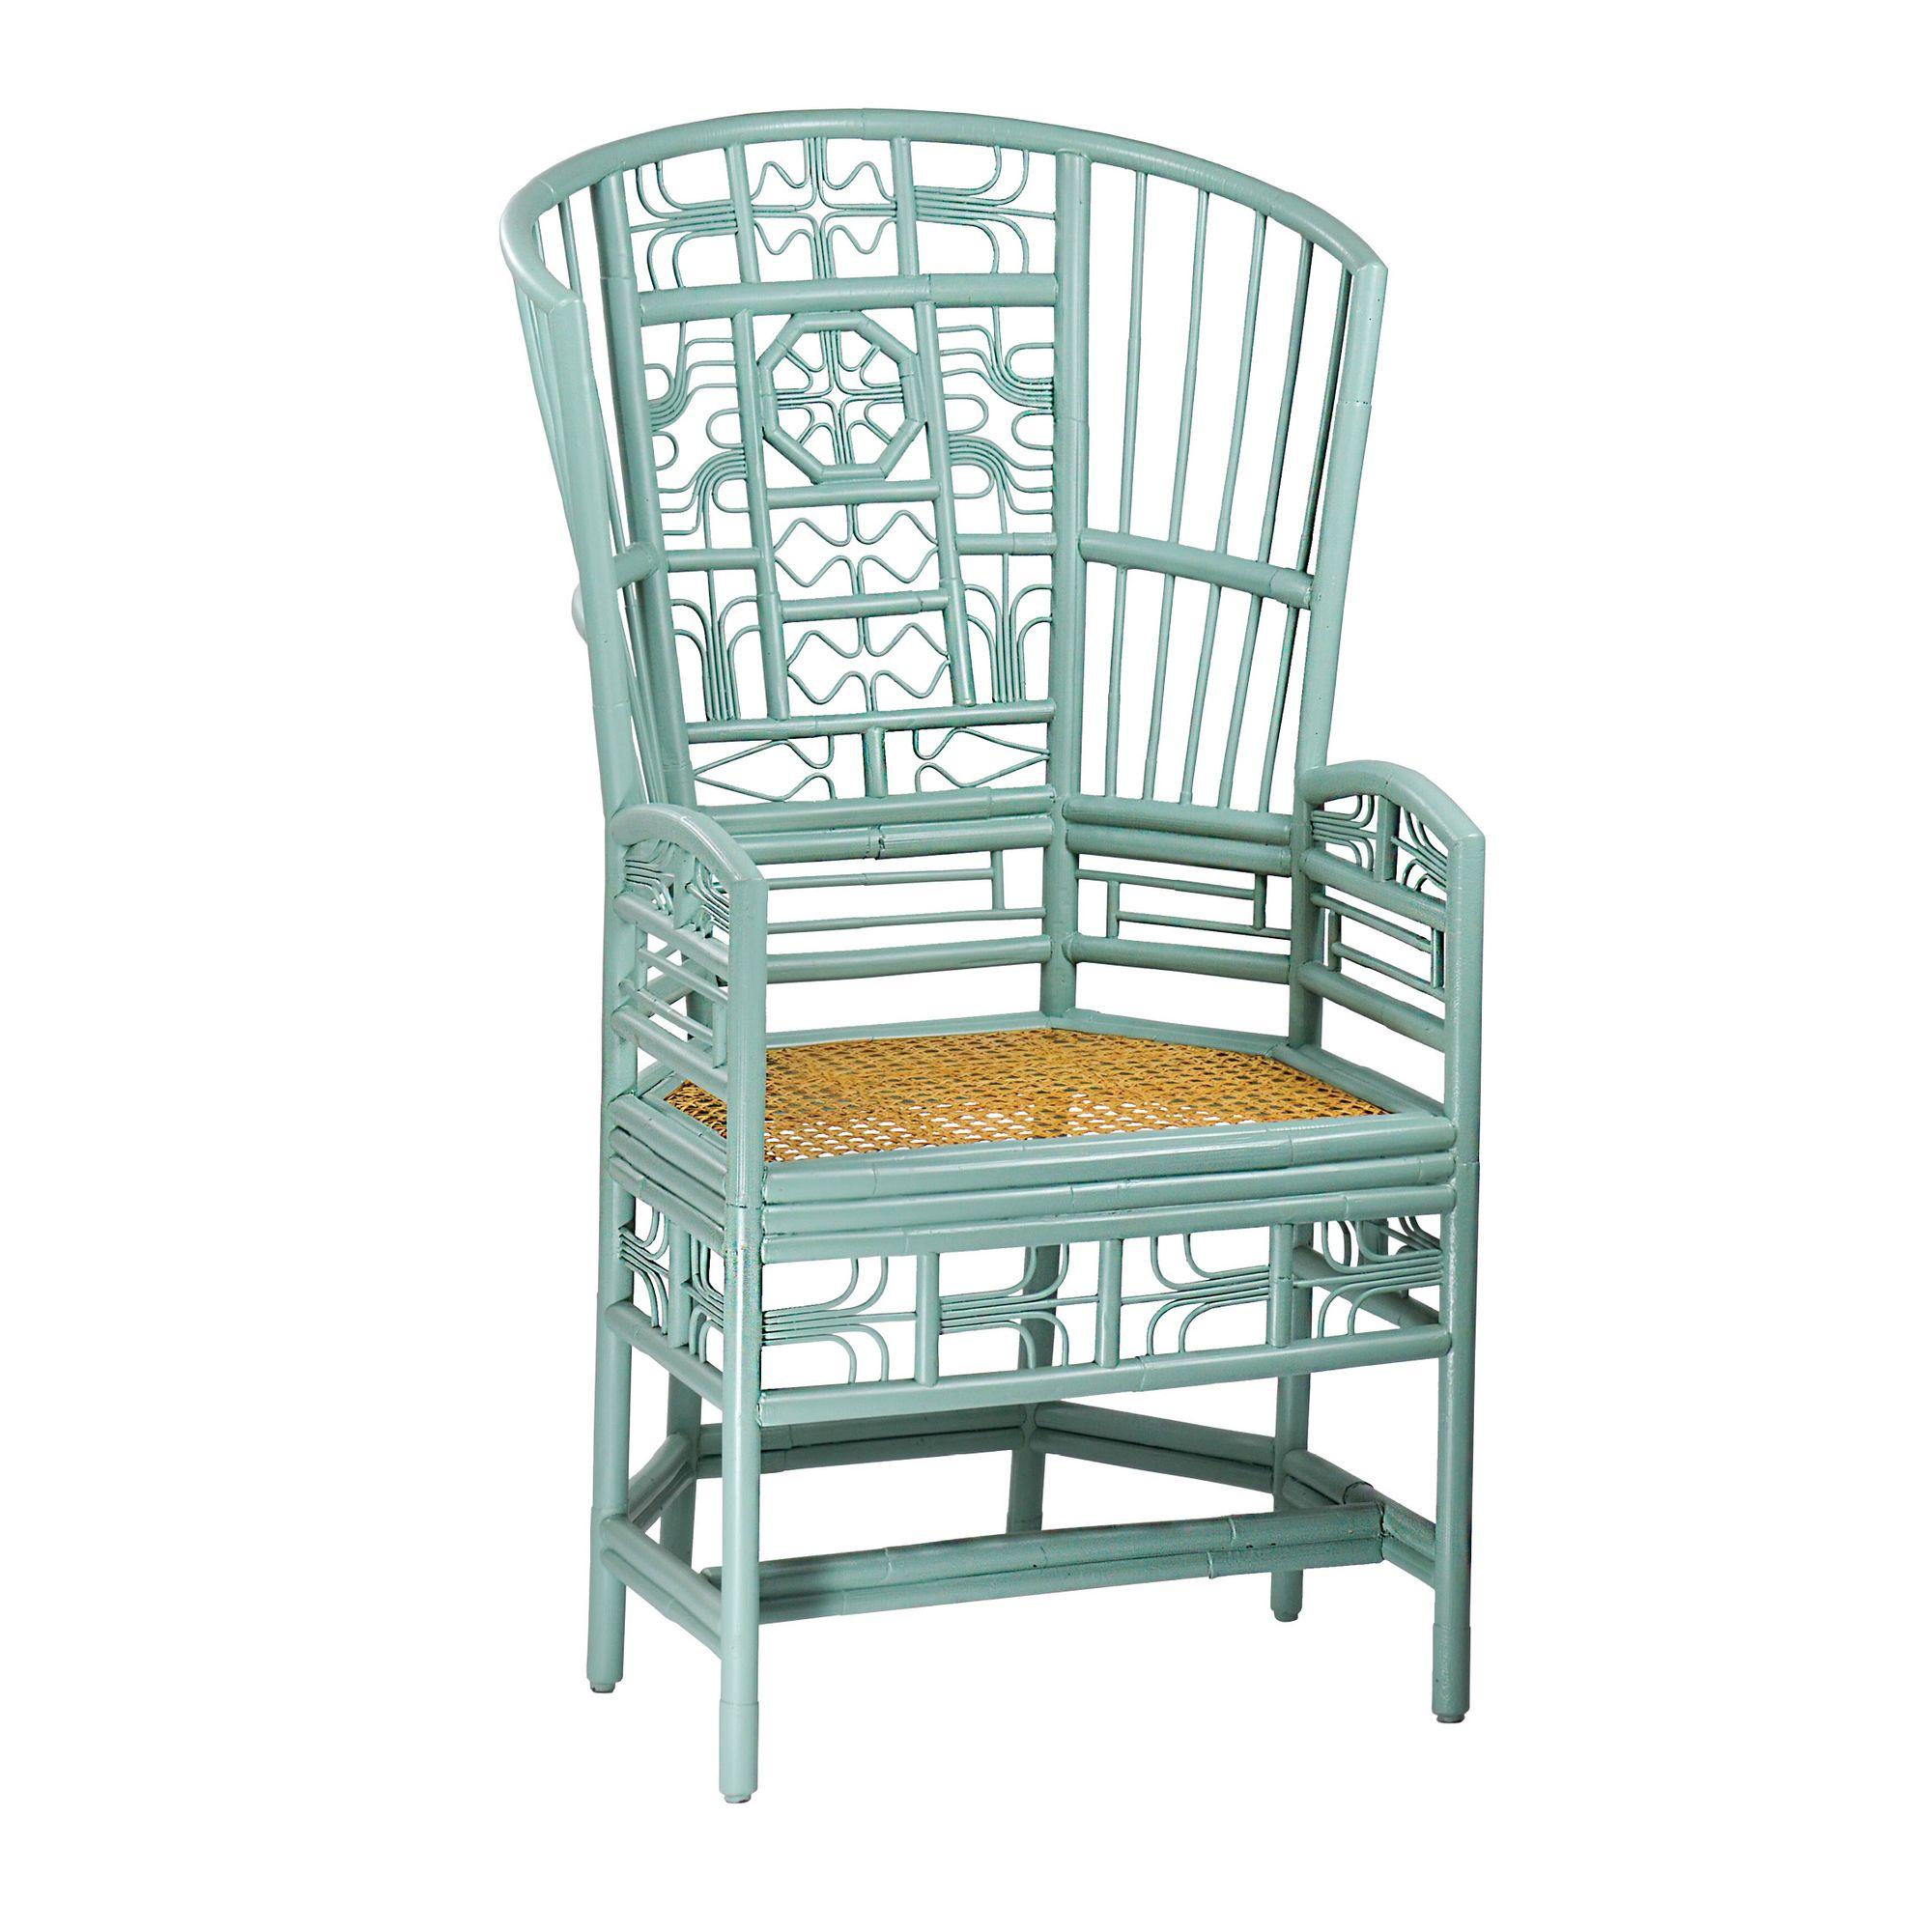 Rattan Chair in 2020 High back chairs, Chair design, Chair